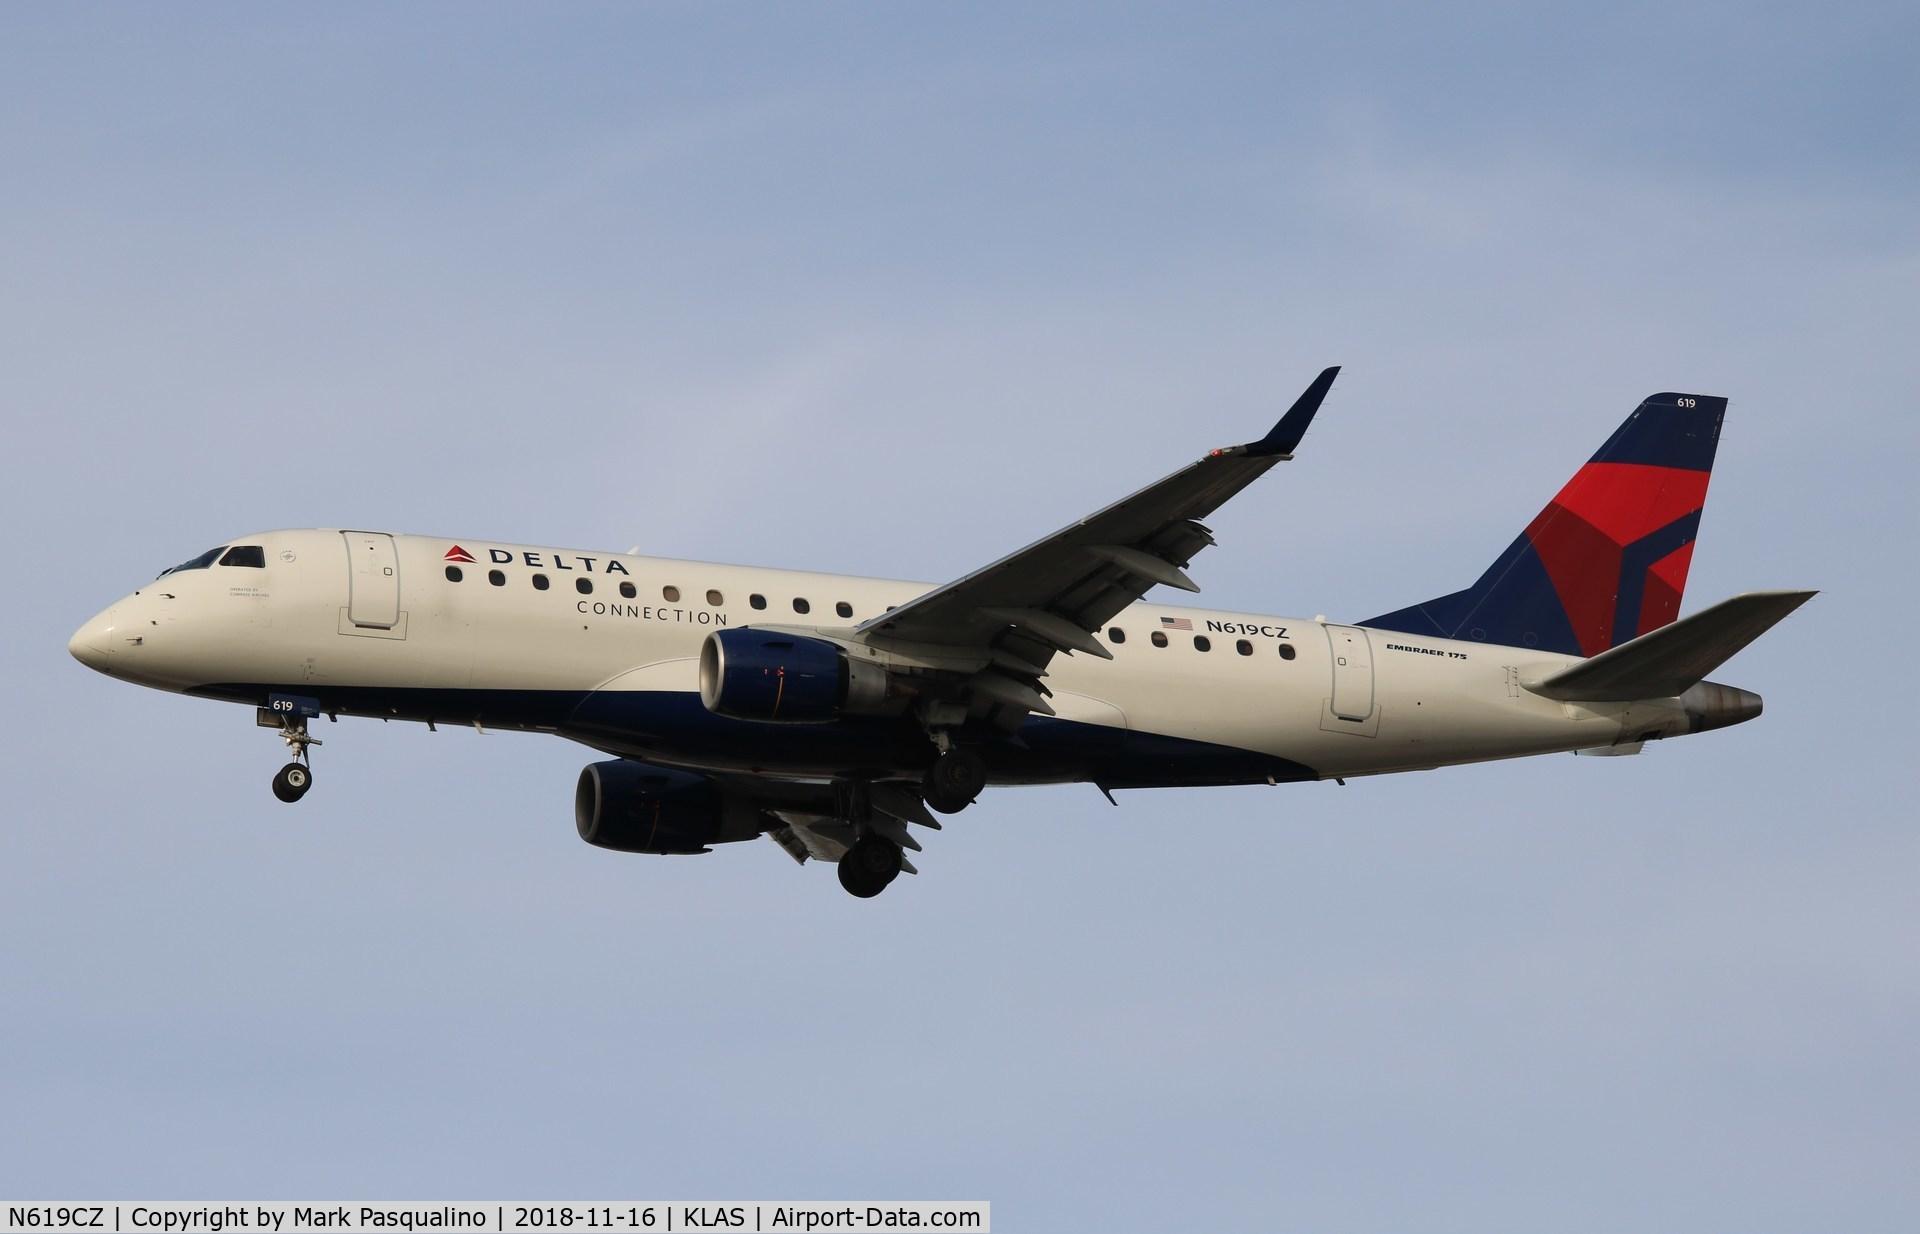 N619CZ, 2008 Embraer 175LR (ERJ-170-200LR) C/N 17000213, ERJ-170-200 LR